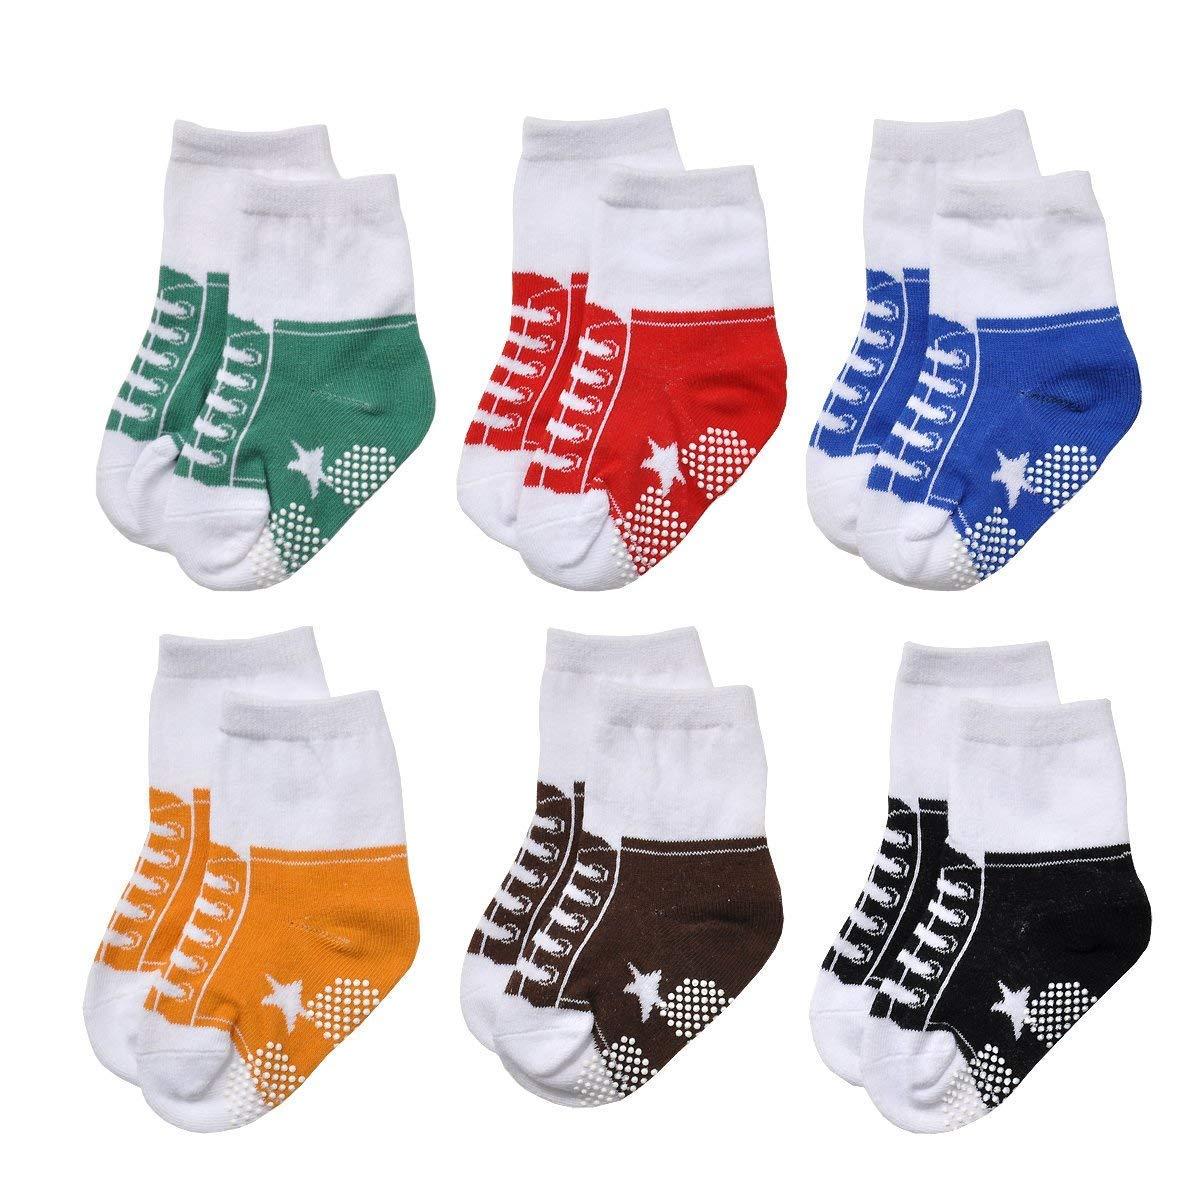 NovForth 12 Pairs Baby's Boy Socks Anti-slip Cotton Socks 12-36 Months Multiple Color Socks